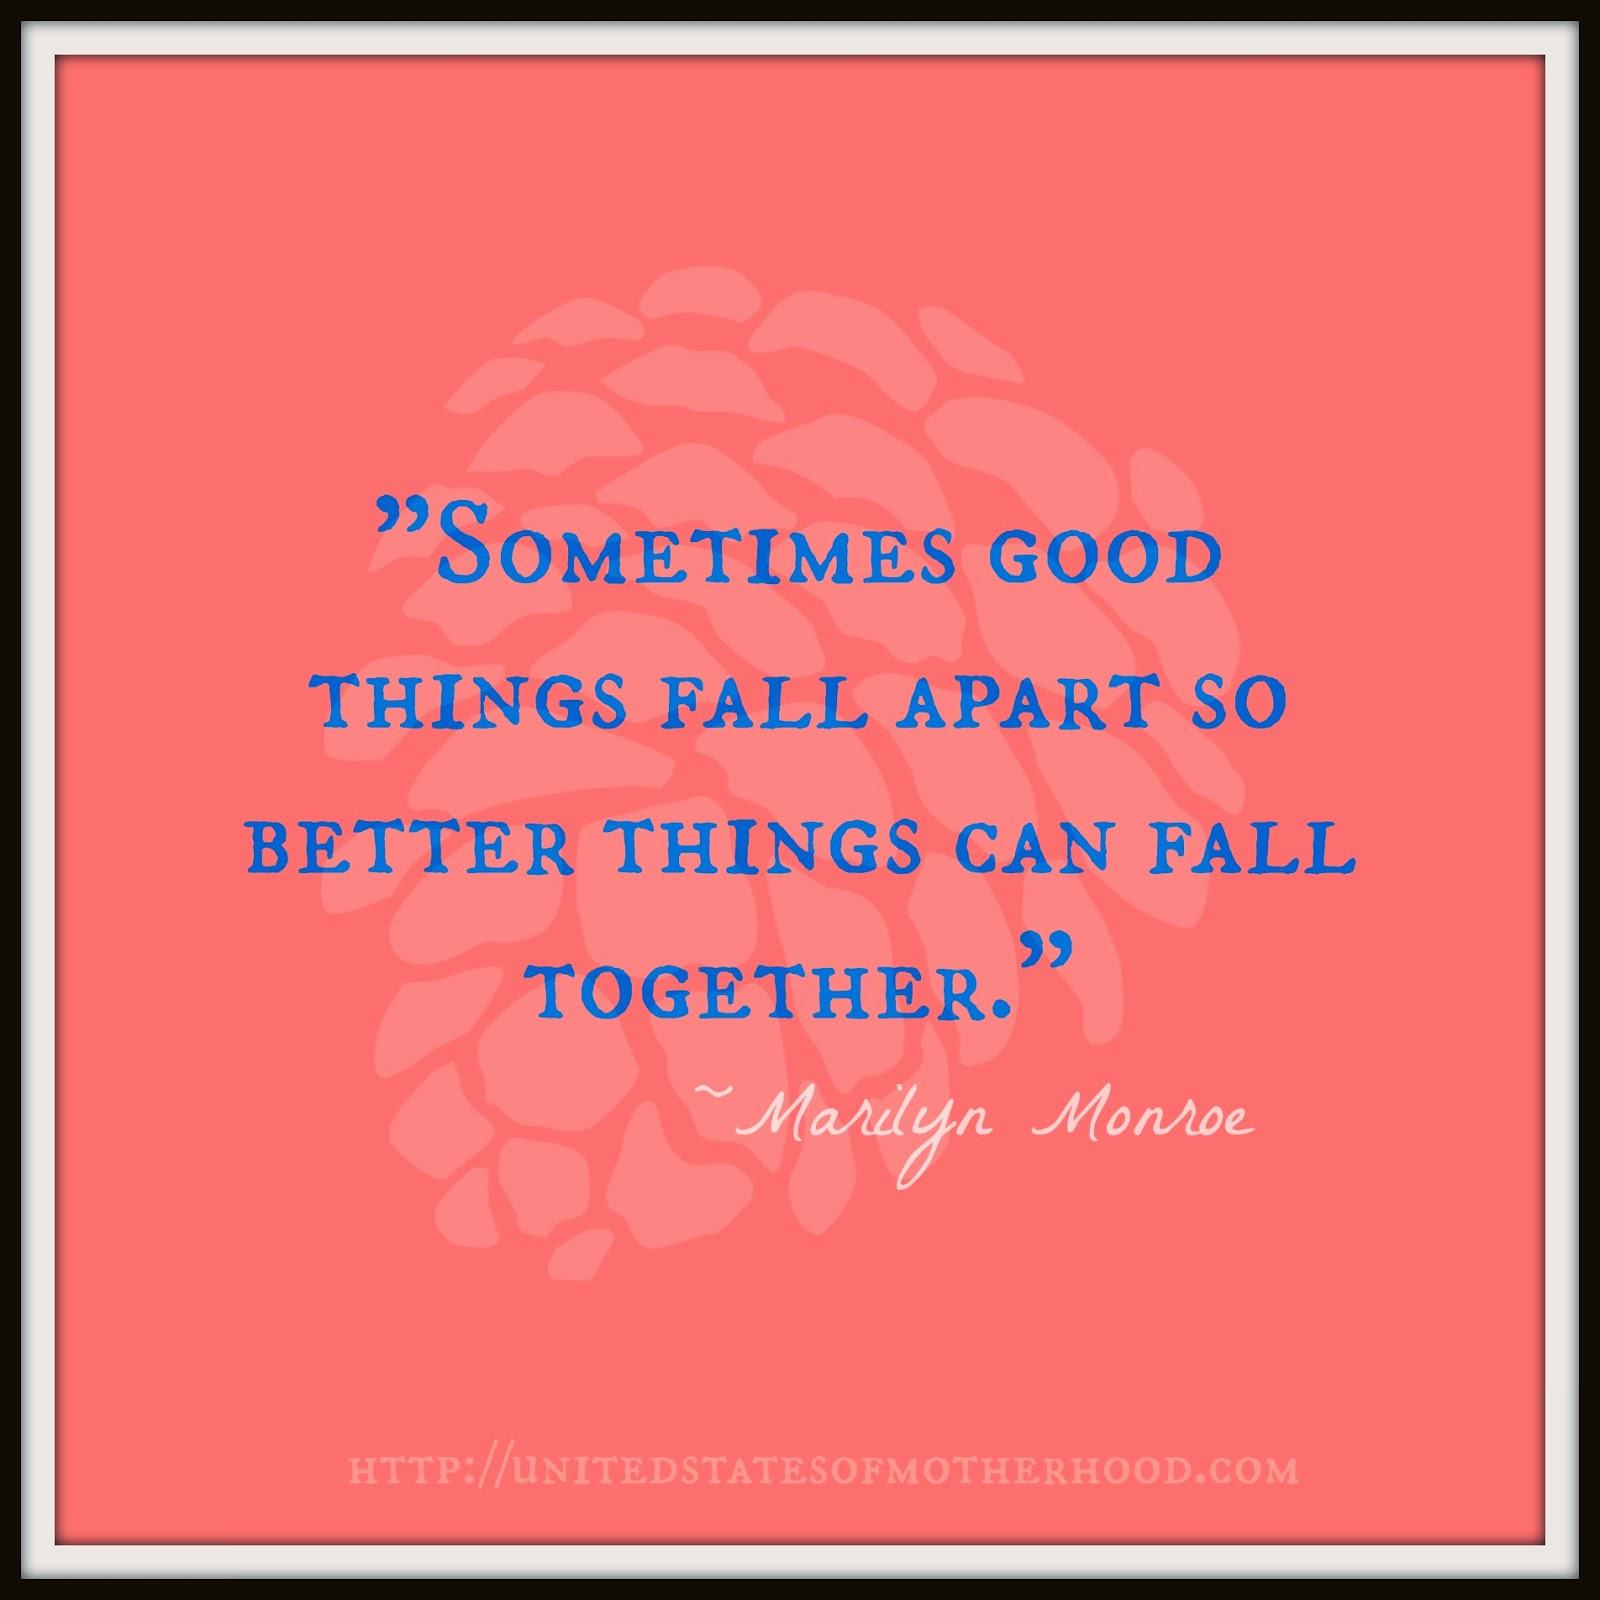 Things Fall Apart Book: Bad Things Fall Apart Quotes. QuotesGram